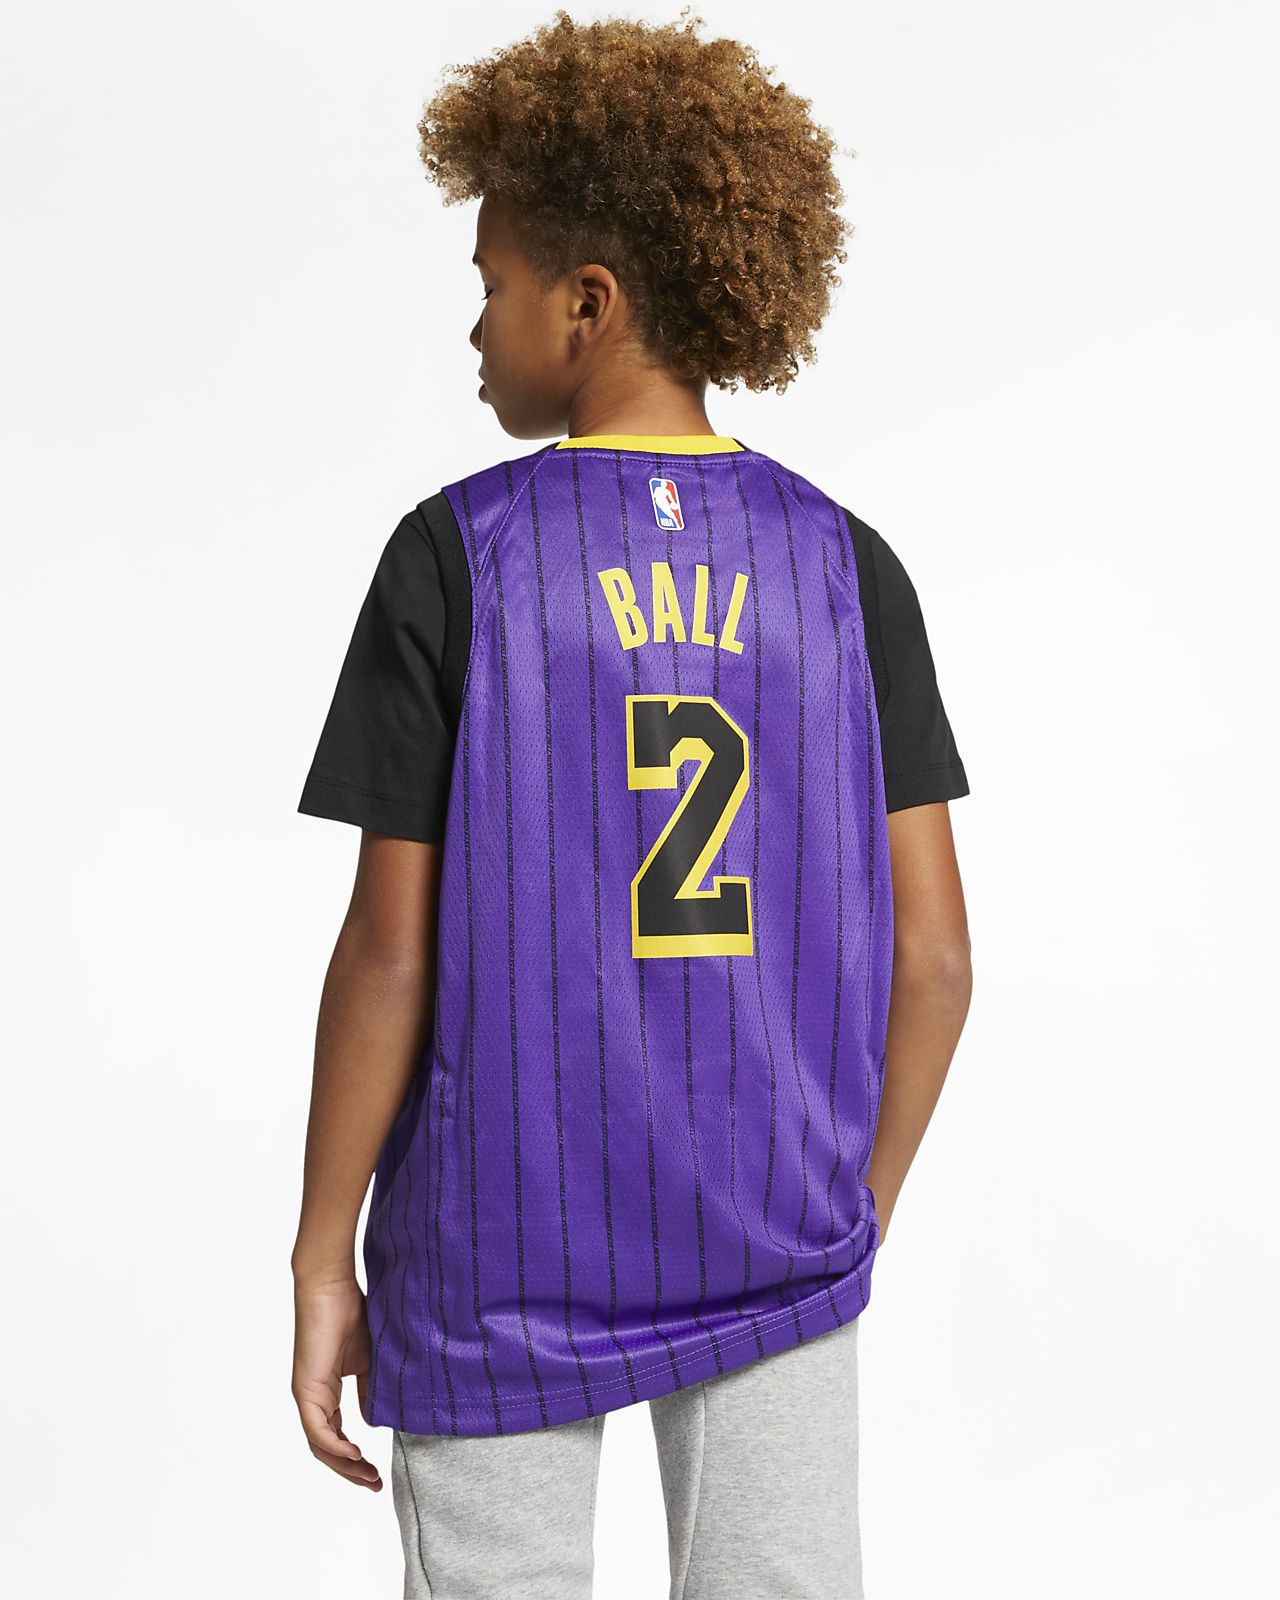 58c88ad025e1 Los Angeles Lakers City Edition Swingman Big Kids  Nike NBA Jersey ...